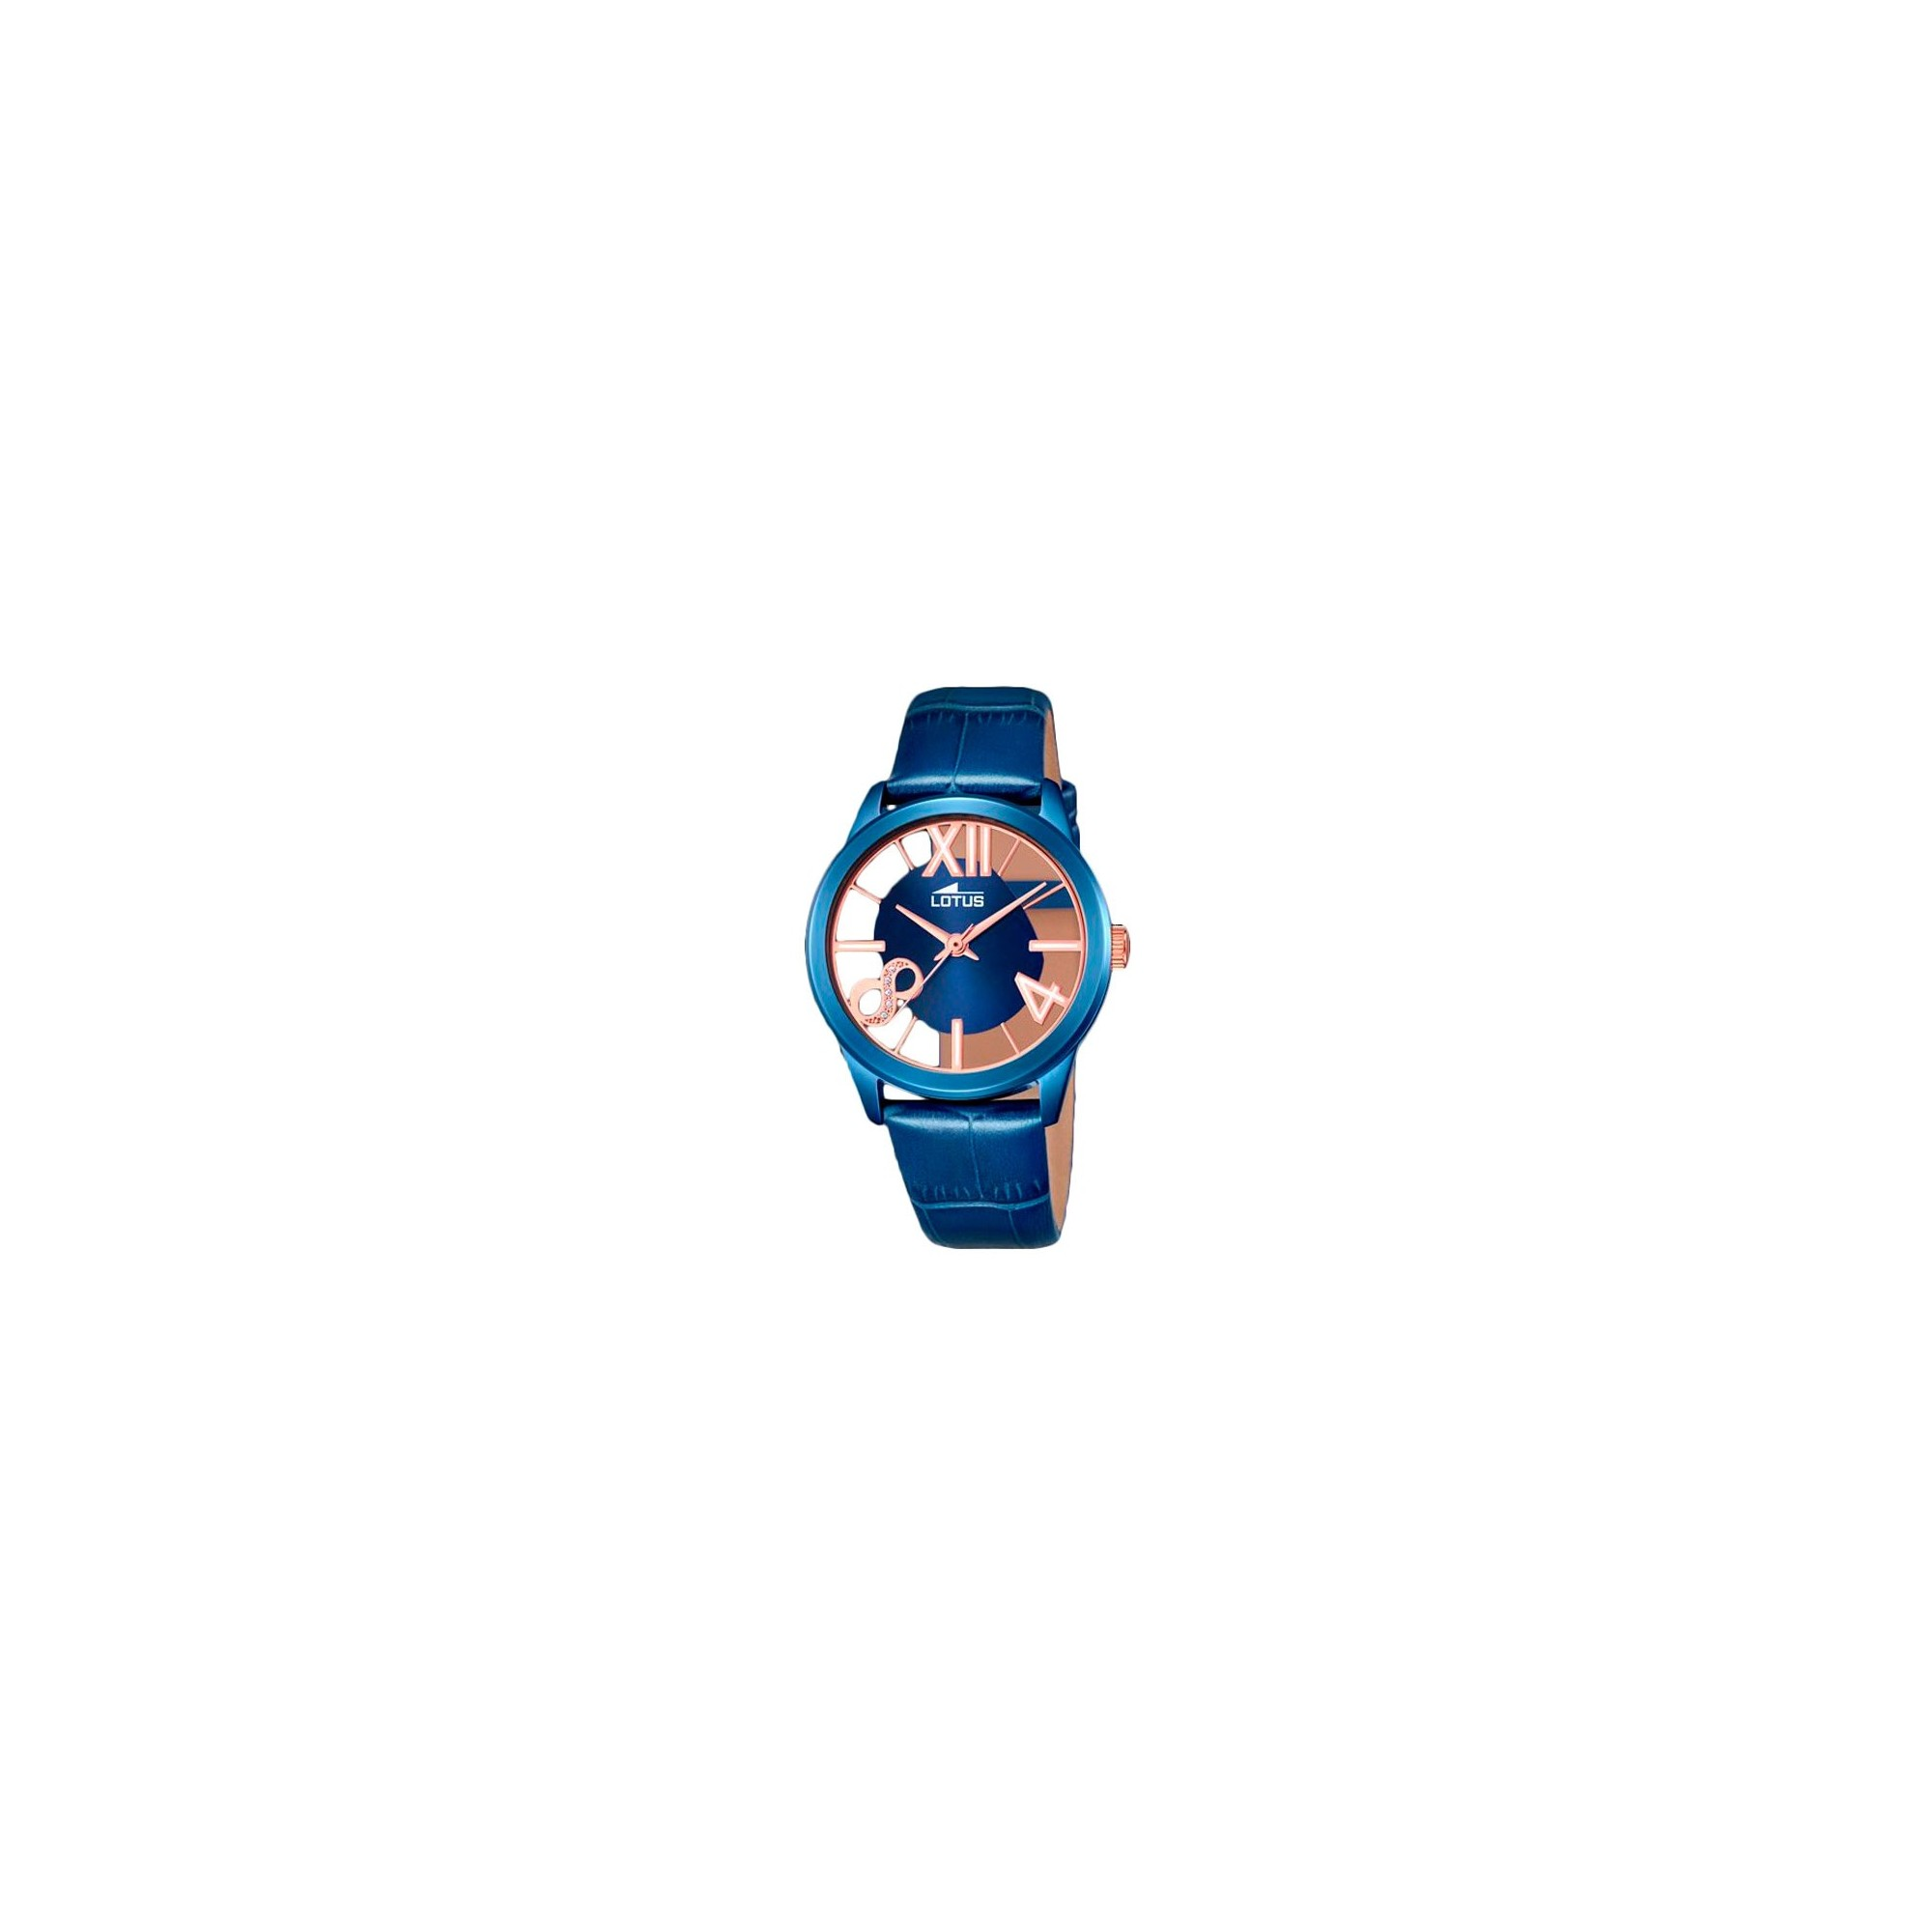 dd85b55636c5 Reloj Lotus Chica Azul Dorado Correa 18307-1